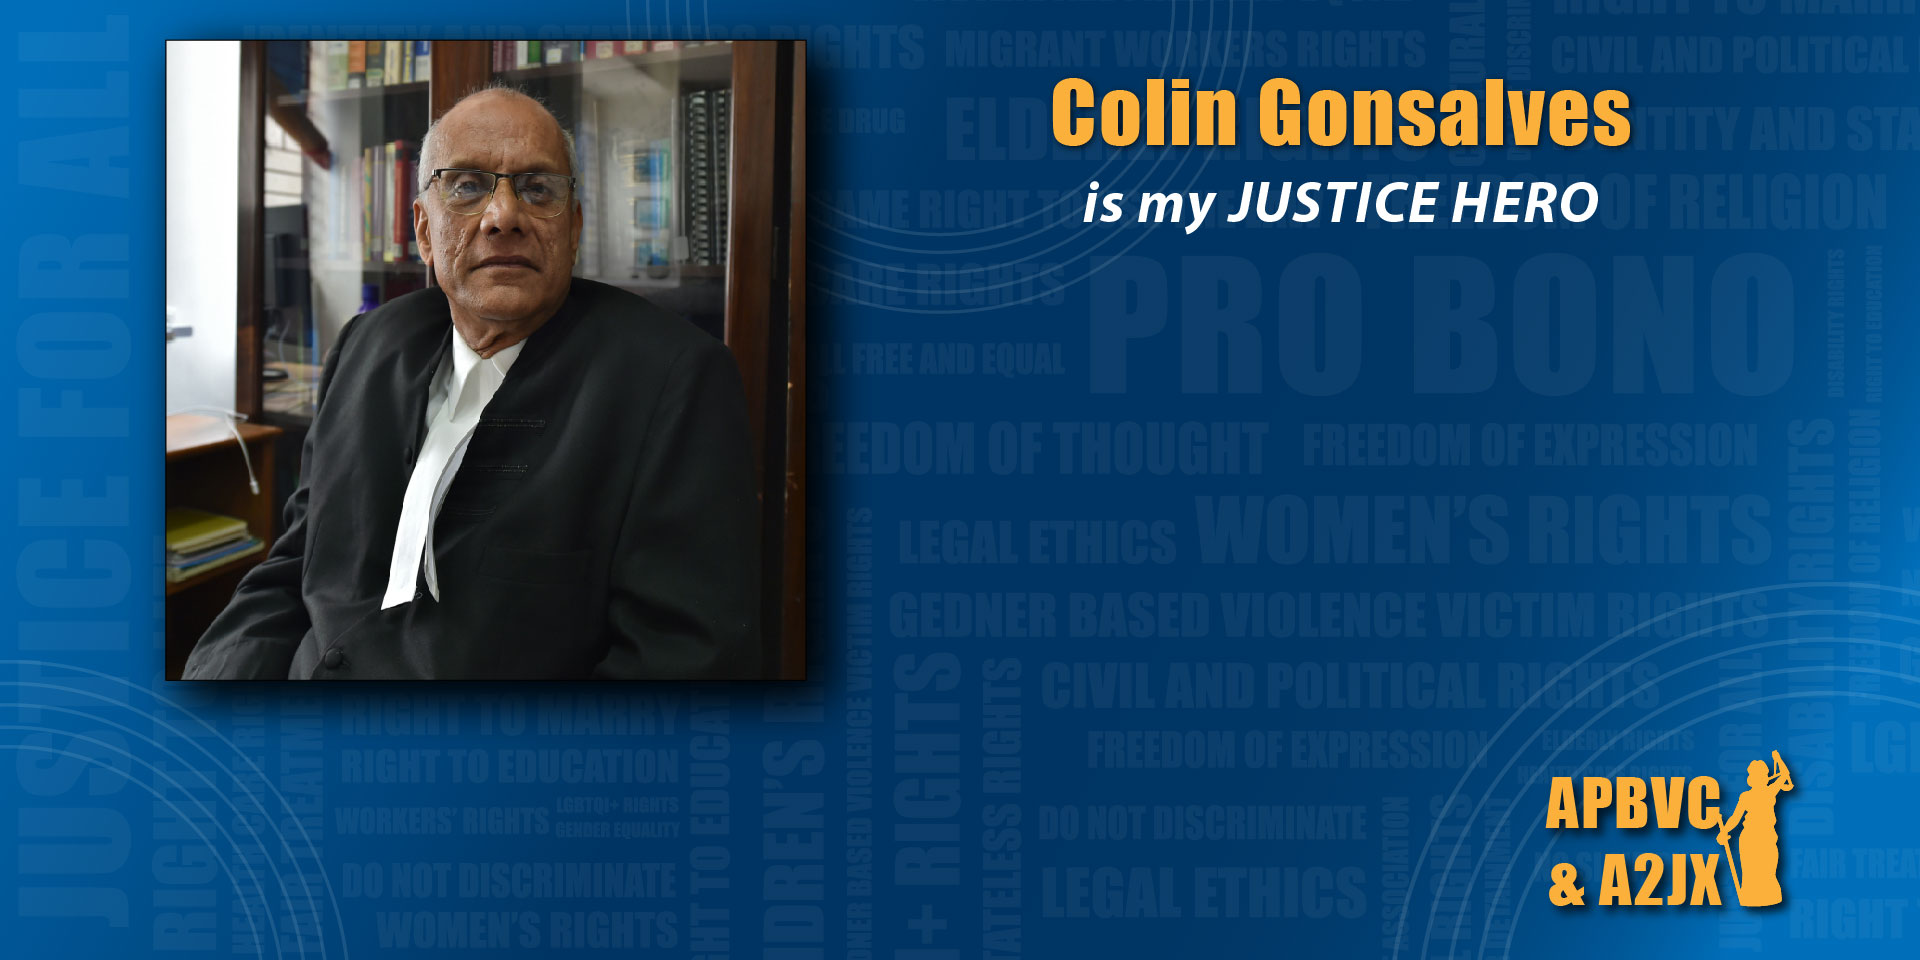 Colin Gonsalves